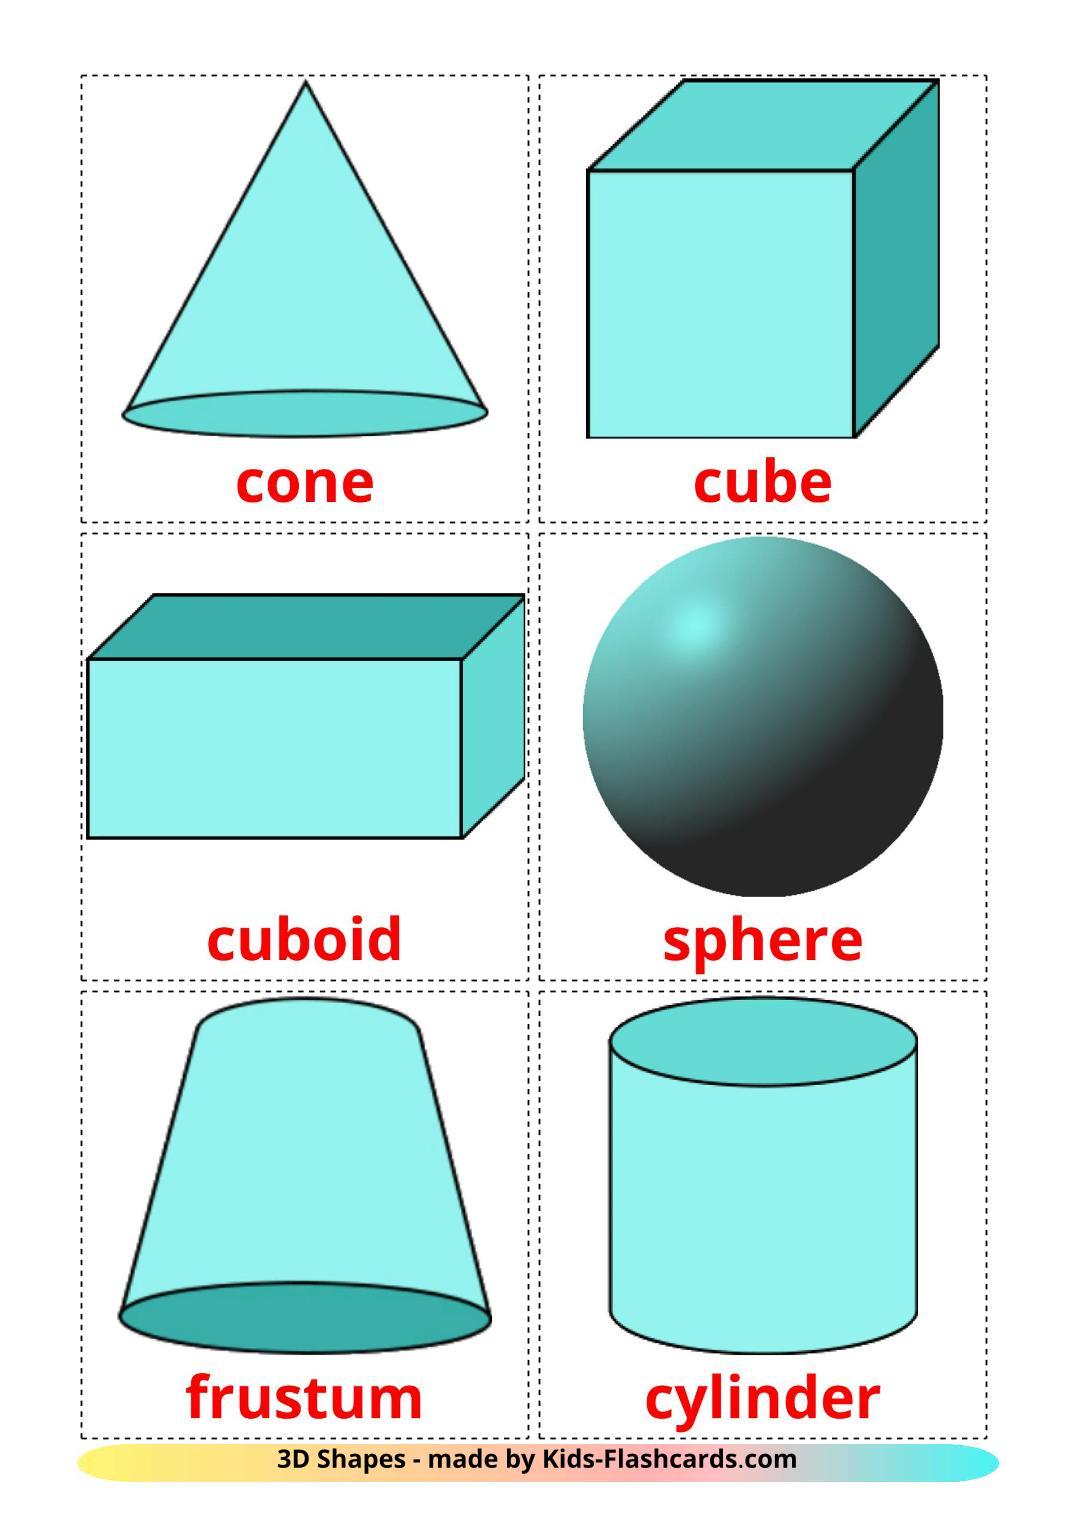 3D Shapes - 17 Free Printable english Flashcards